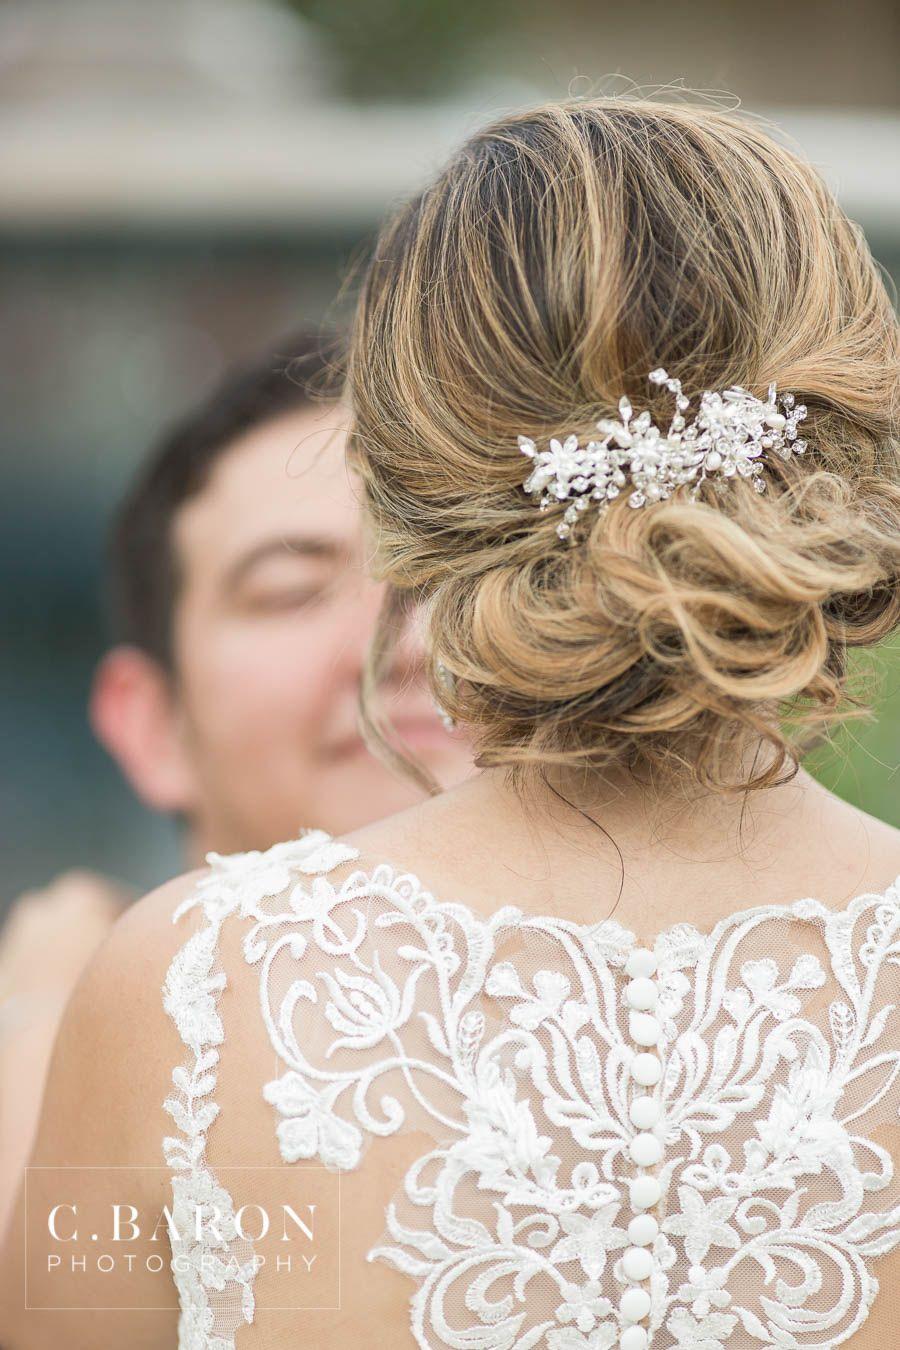 wedding updo wedding hair accessories wedding hairstyles summer wedding hairstyles summer